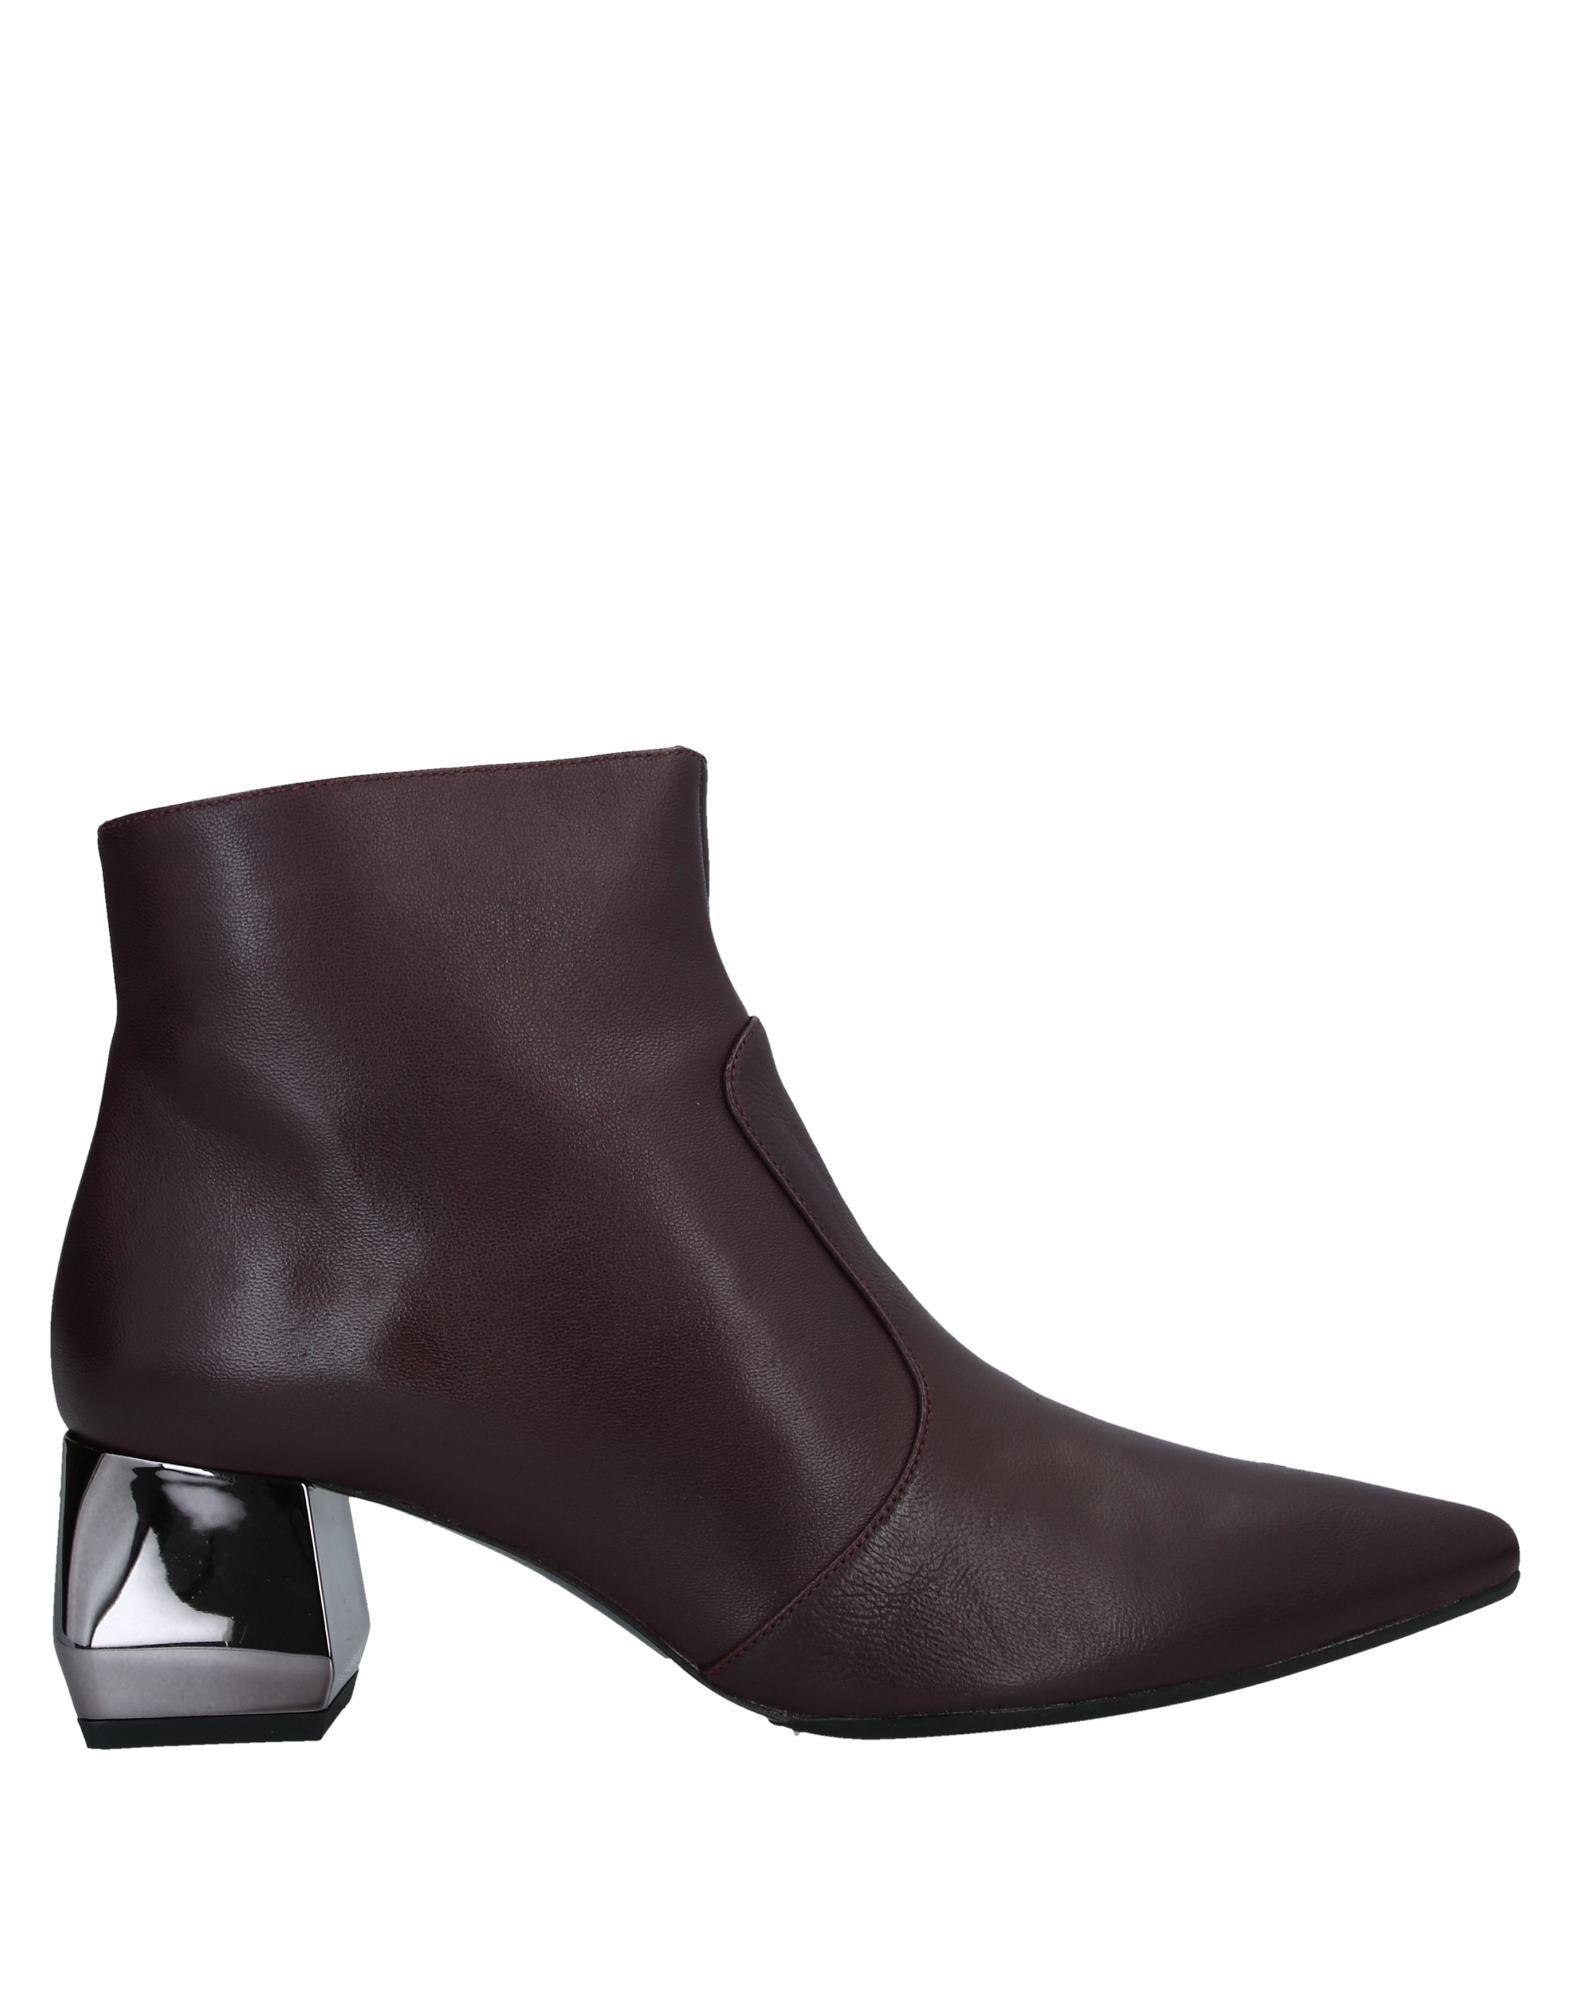 Фото - ANNA BAIGUERA Полусапоги и высокие ботинки anna baiguera полусапоги и высокие ботинки